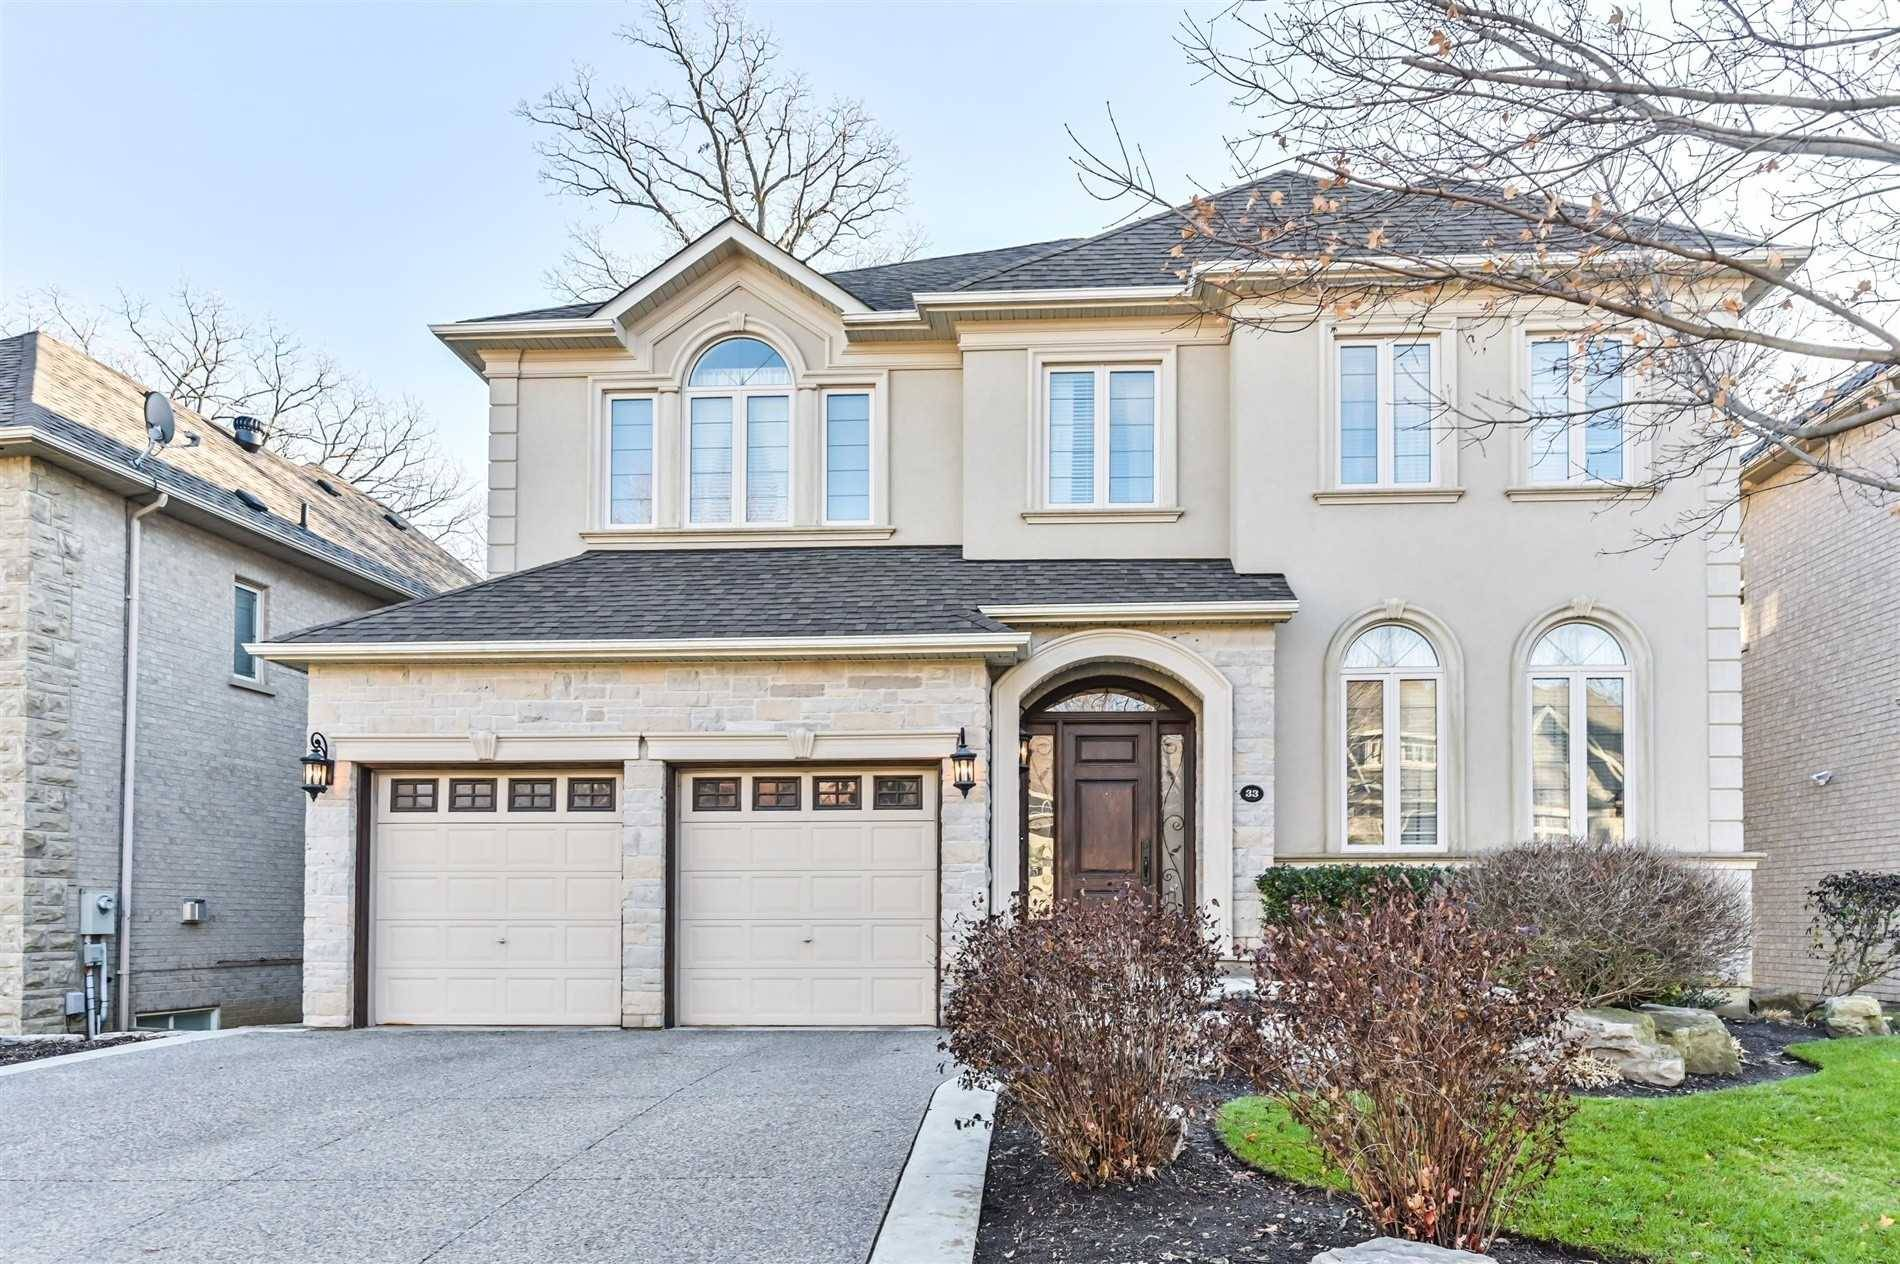 House for sale at 33 Danbury Ct Markham Ontario - MLS: N4650871